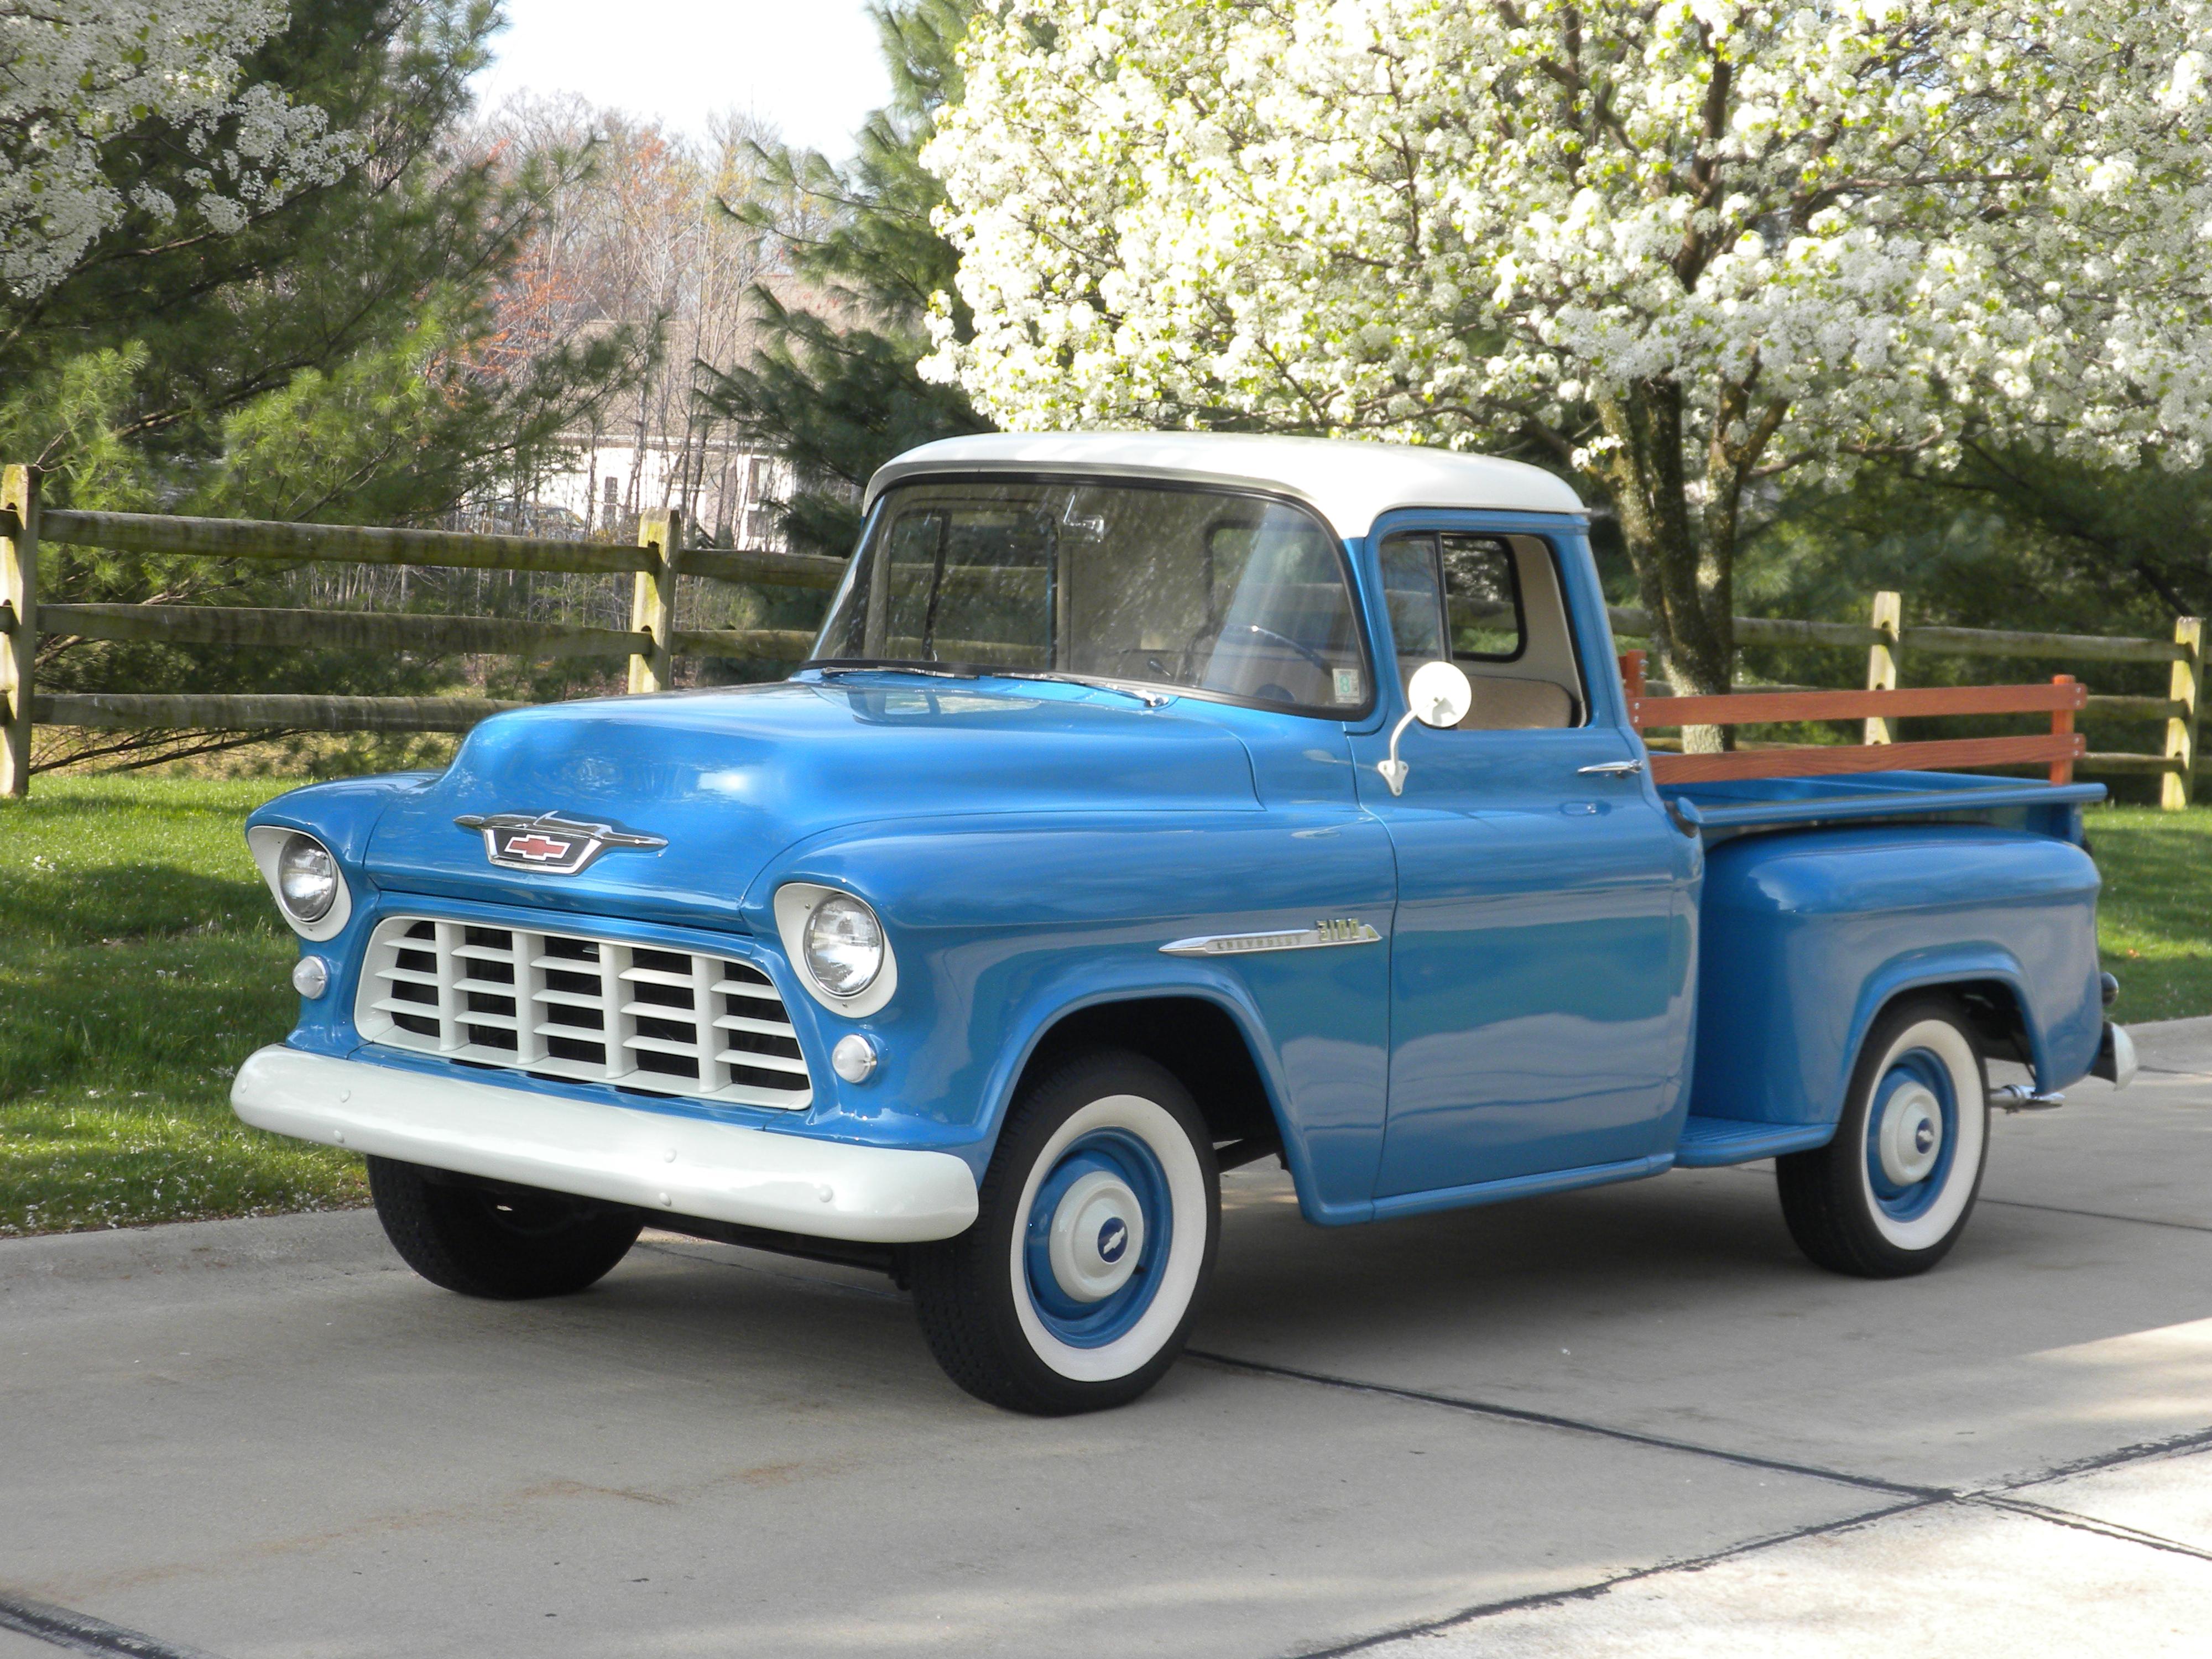 original 55 truck.jpg